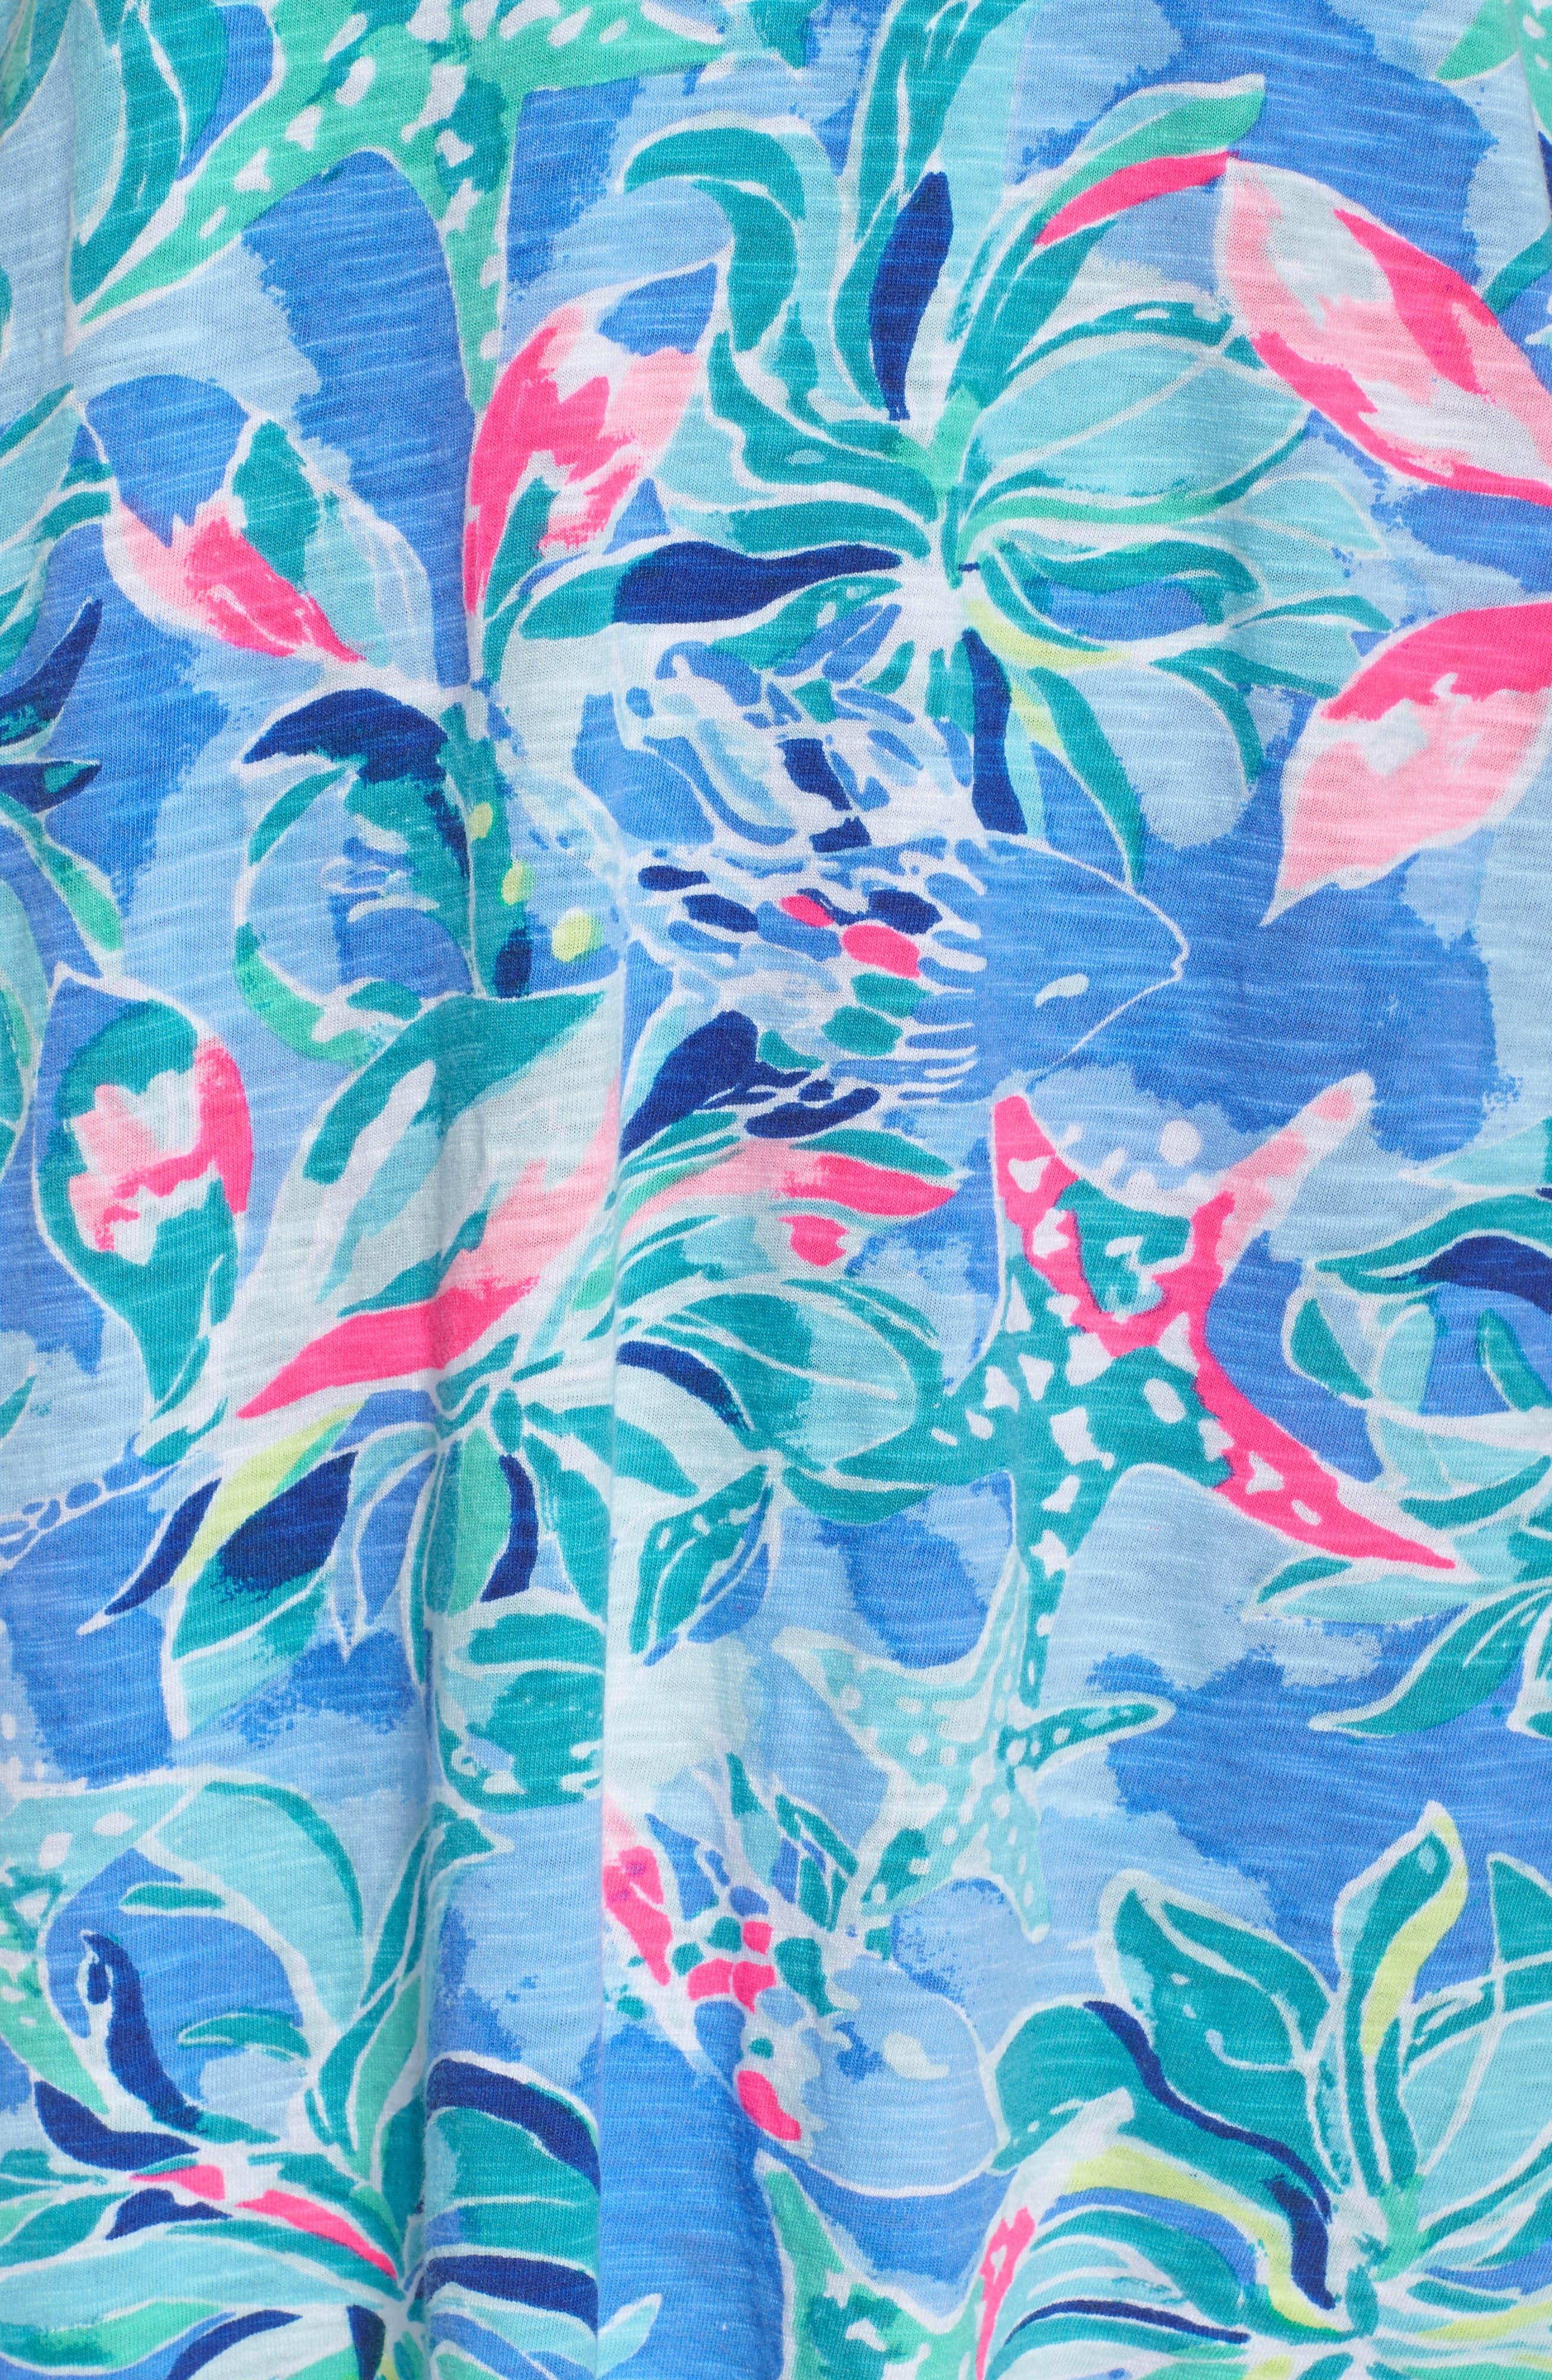 Shay Ruffle Halter Dress,                             Alternate thumbnail 5, color,                             Bennet Blue Celestial Seas